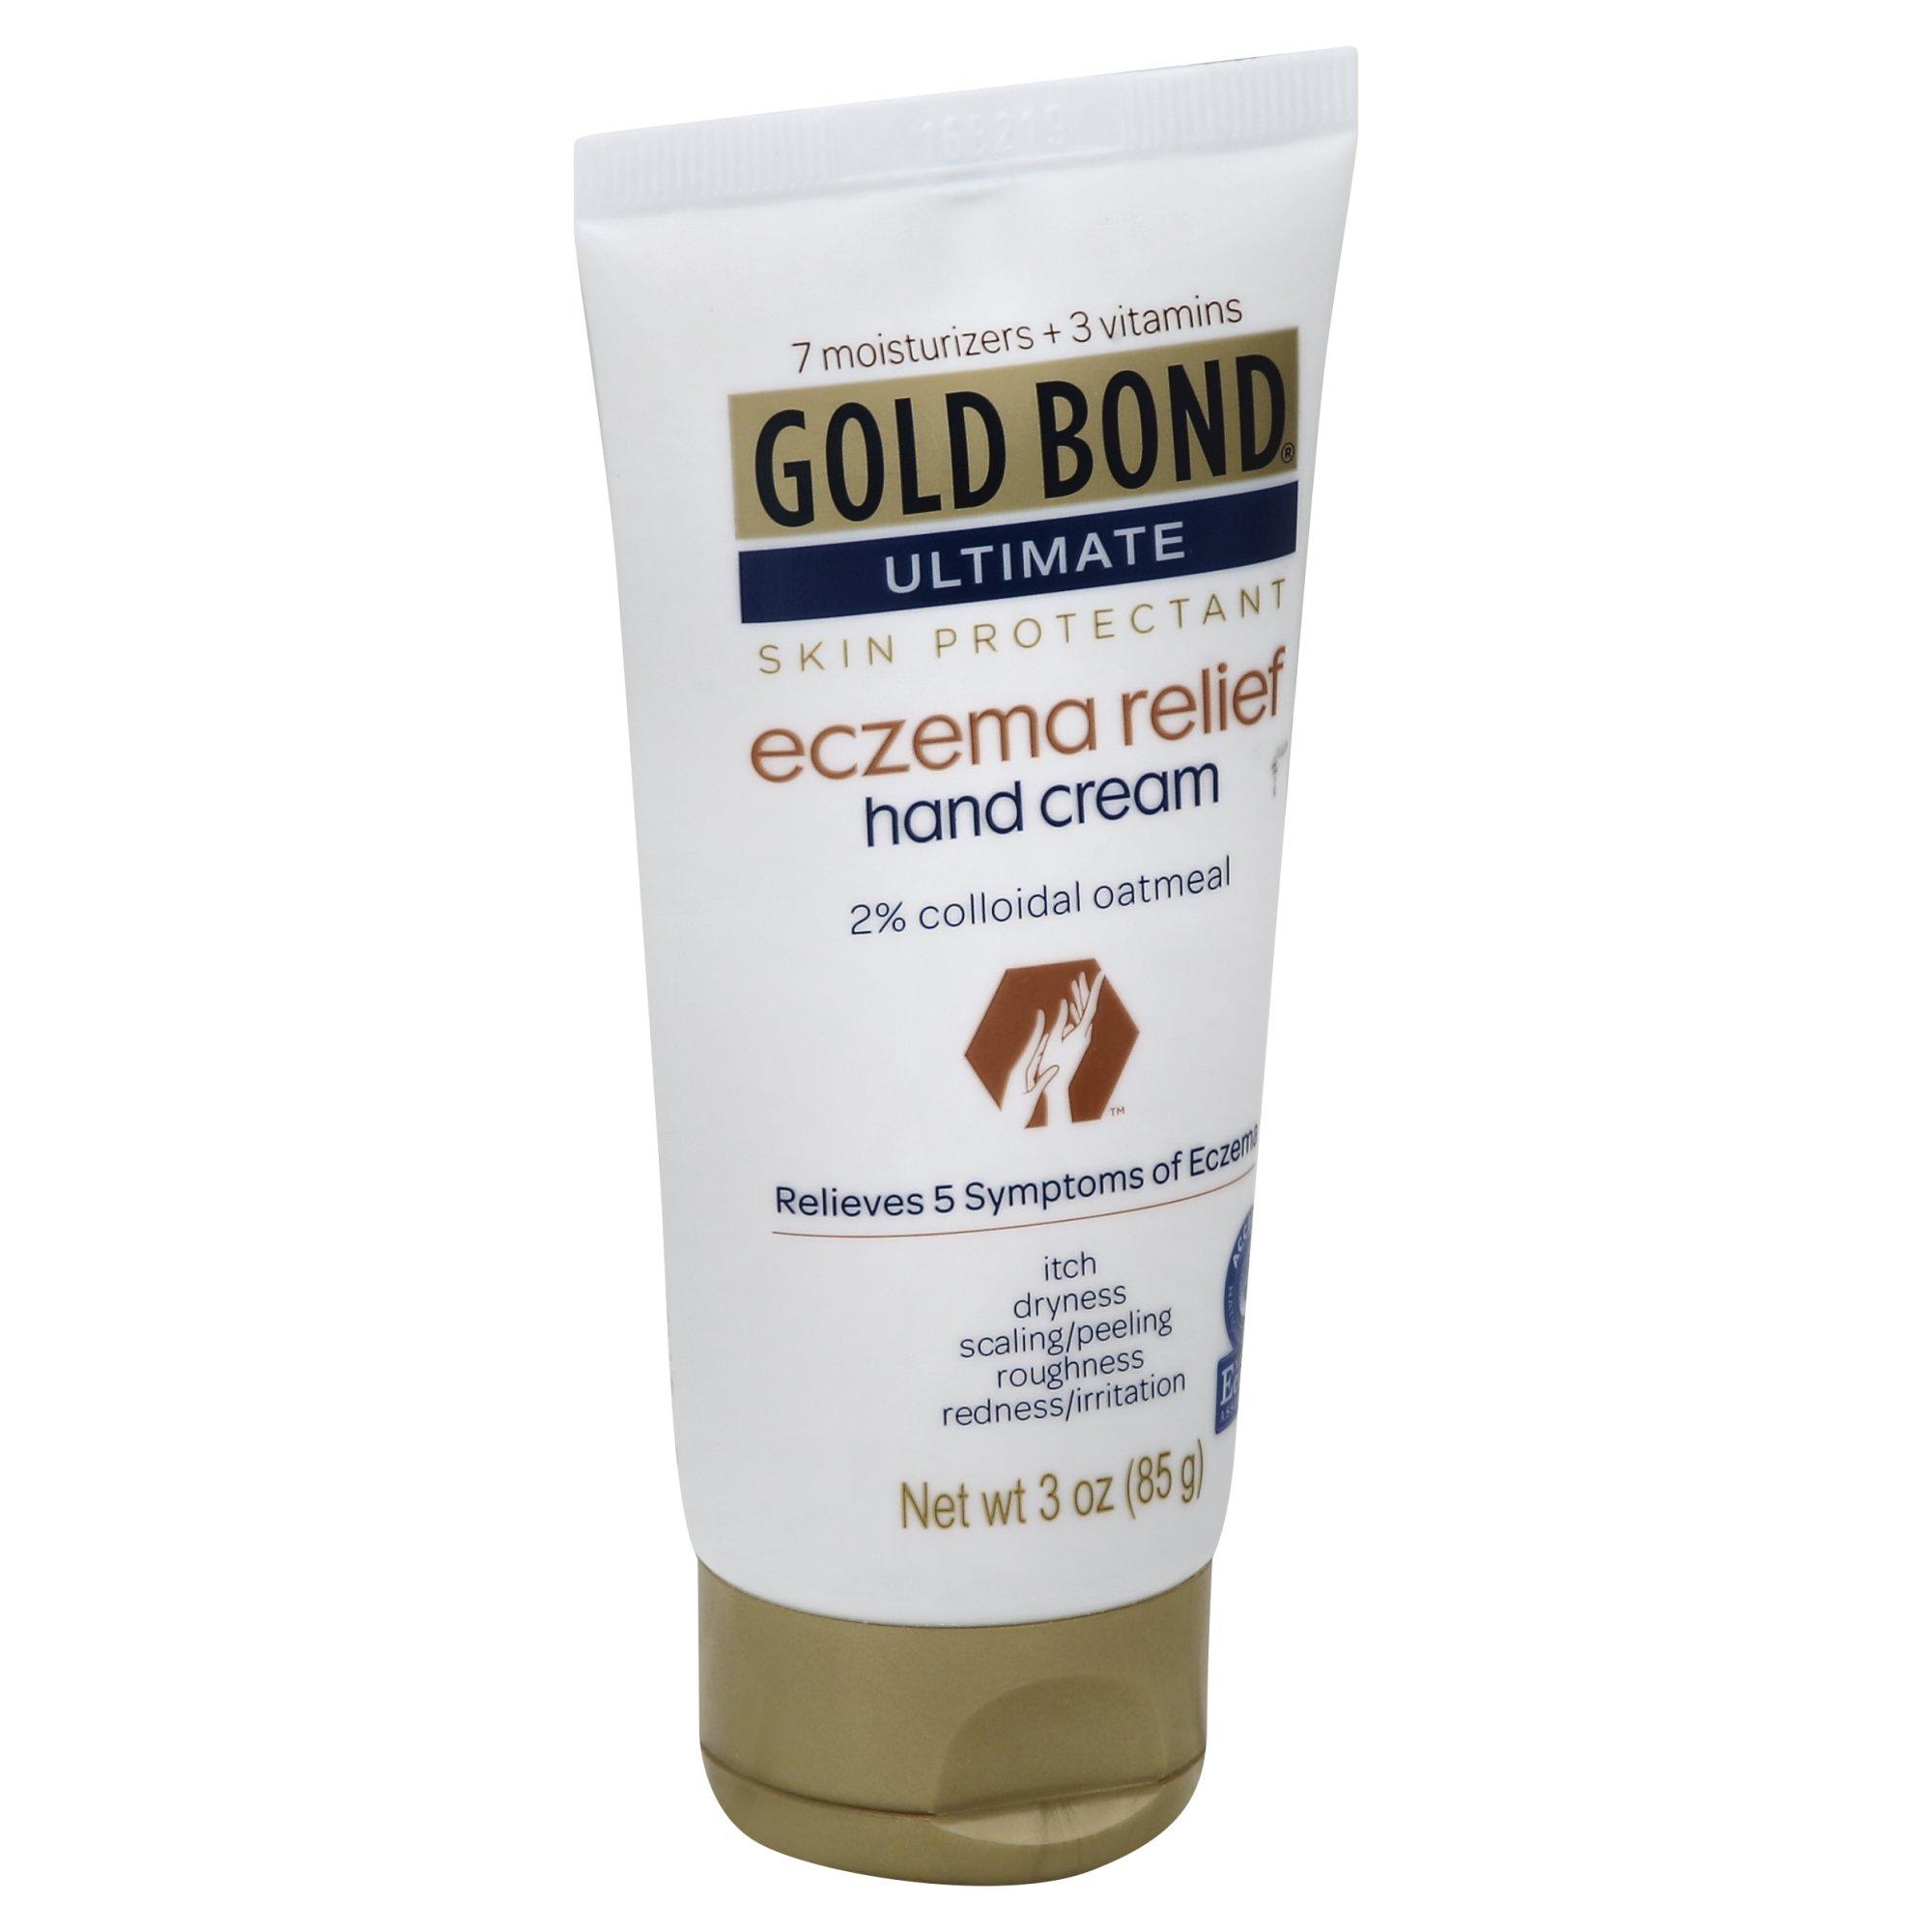 Gold Bond Ultimate Eczema Relief Hand Cream 3 Oz